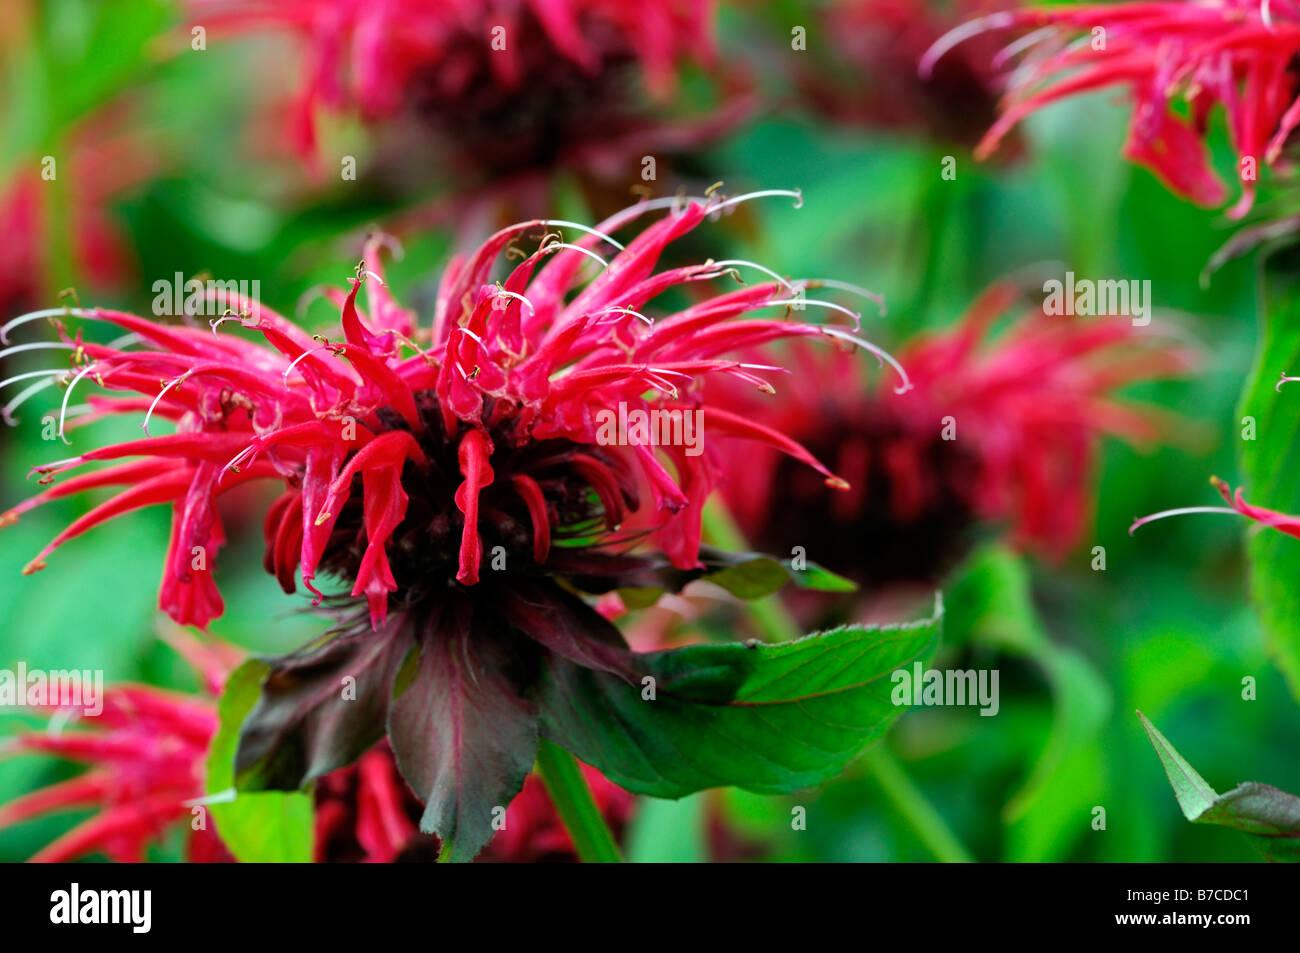 monarda feuerball bergamotte rote blume garten pflanze. Black Bedroom Furniture Sets. Home Design Ideas